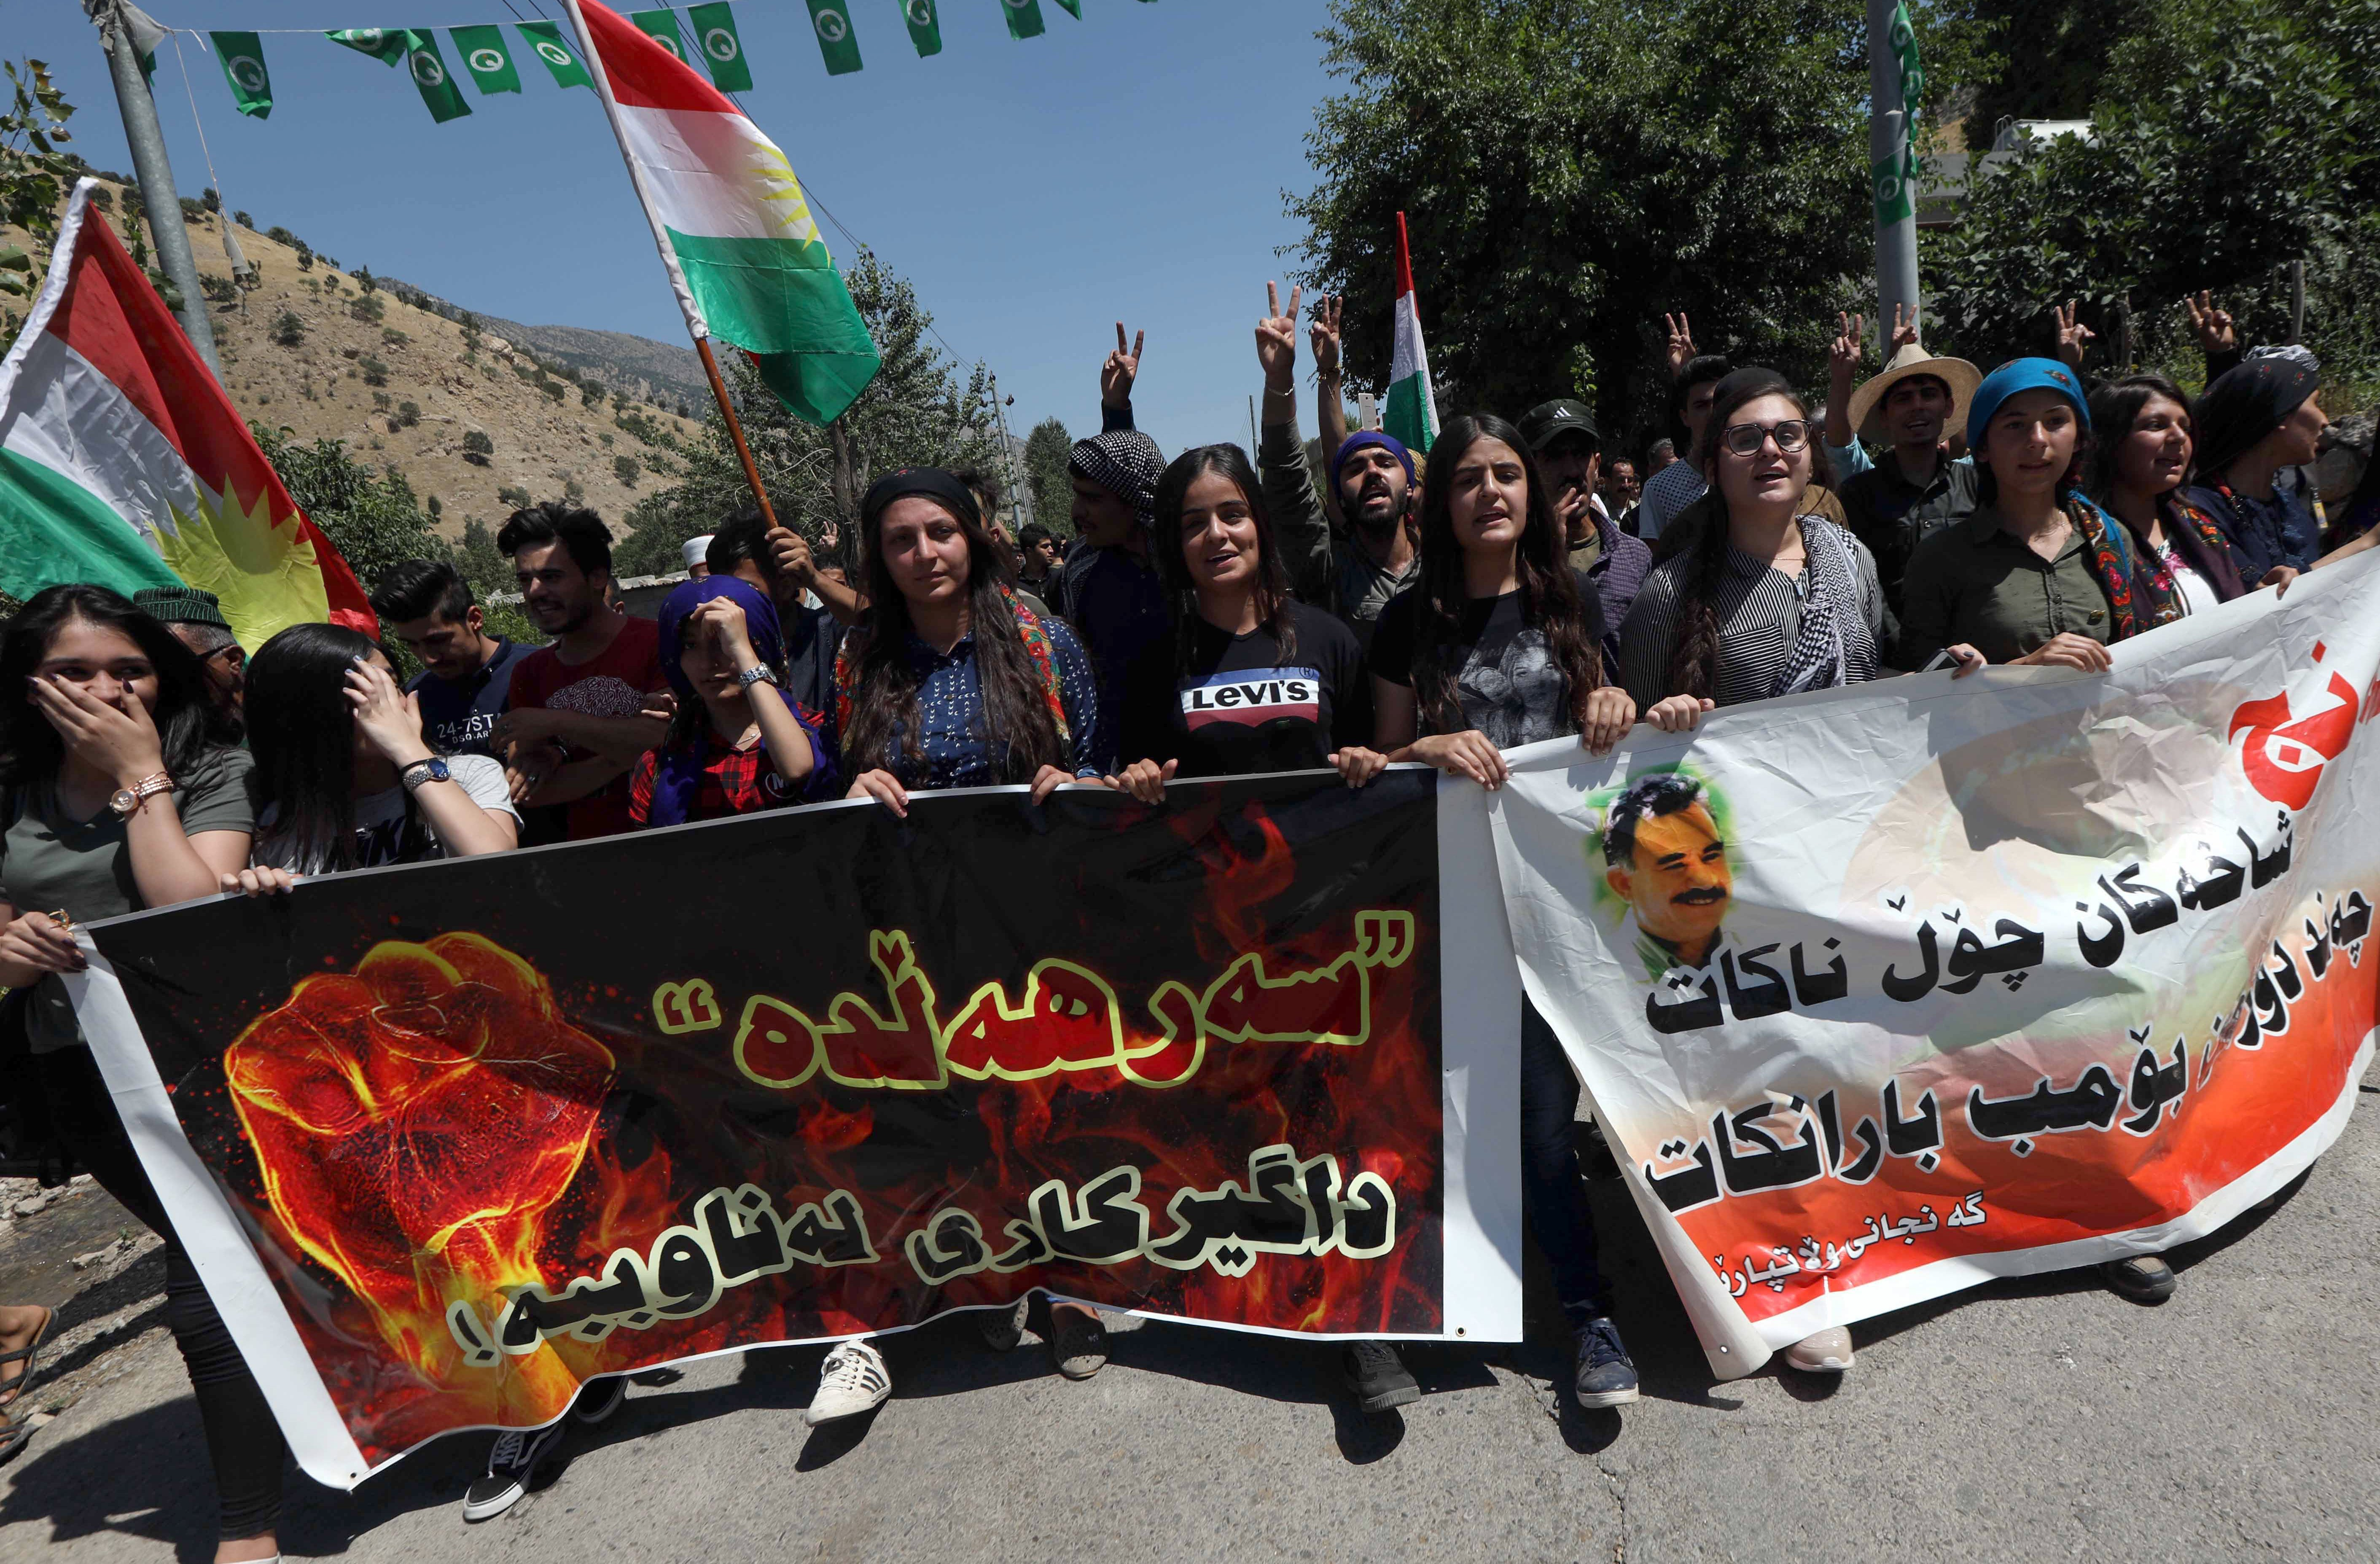 Kurdish tensions in northern Iraq raise prospects of PKK crackdown